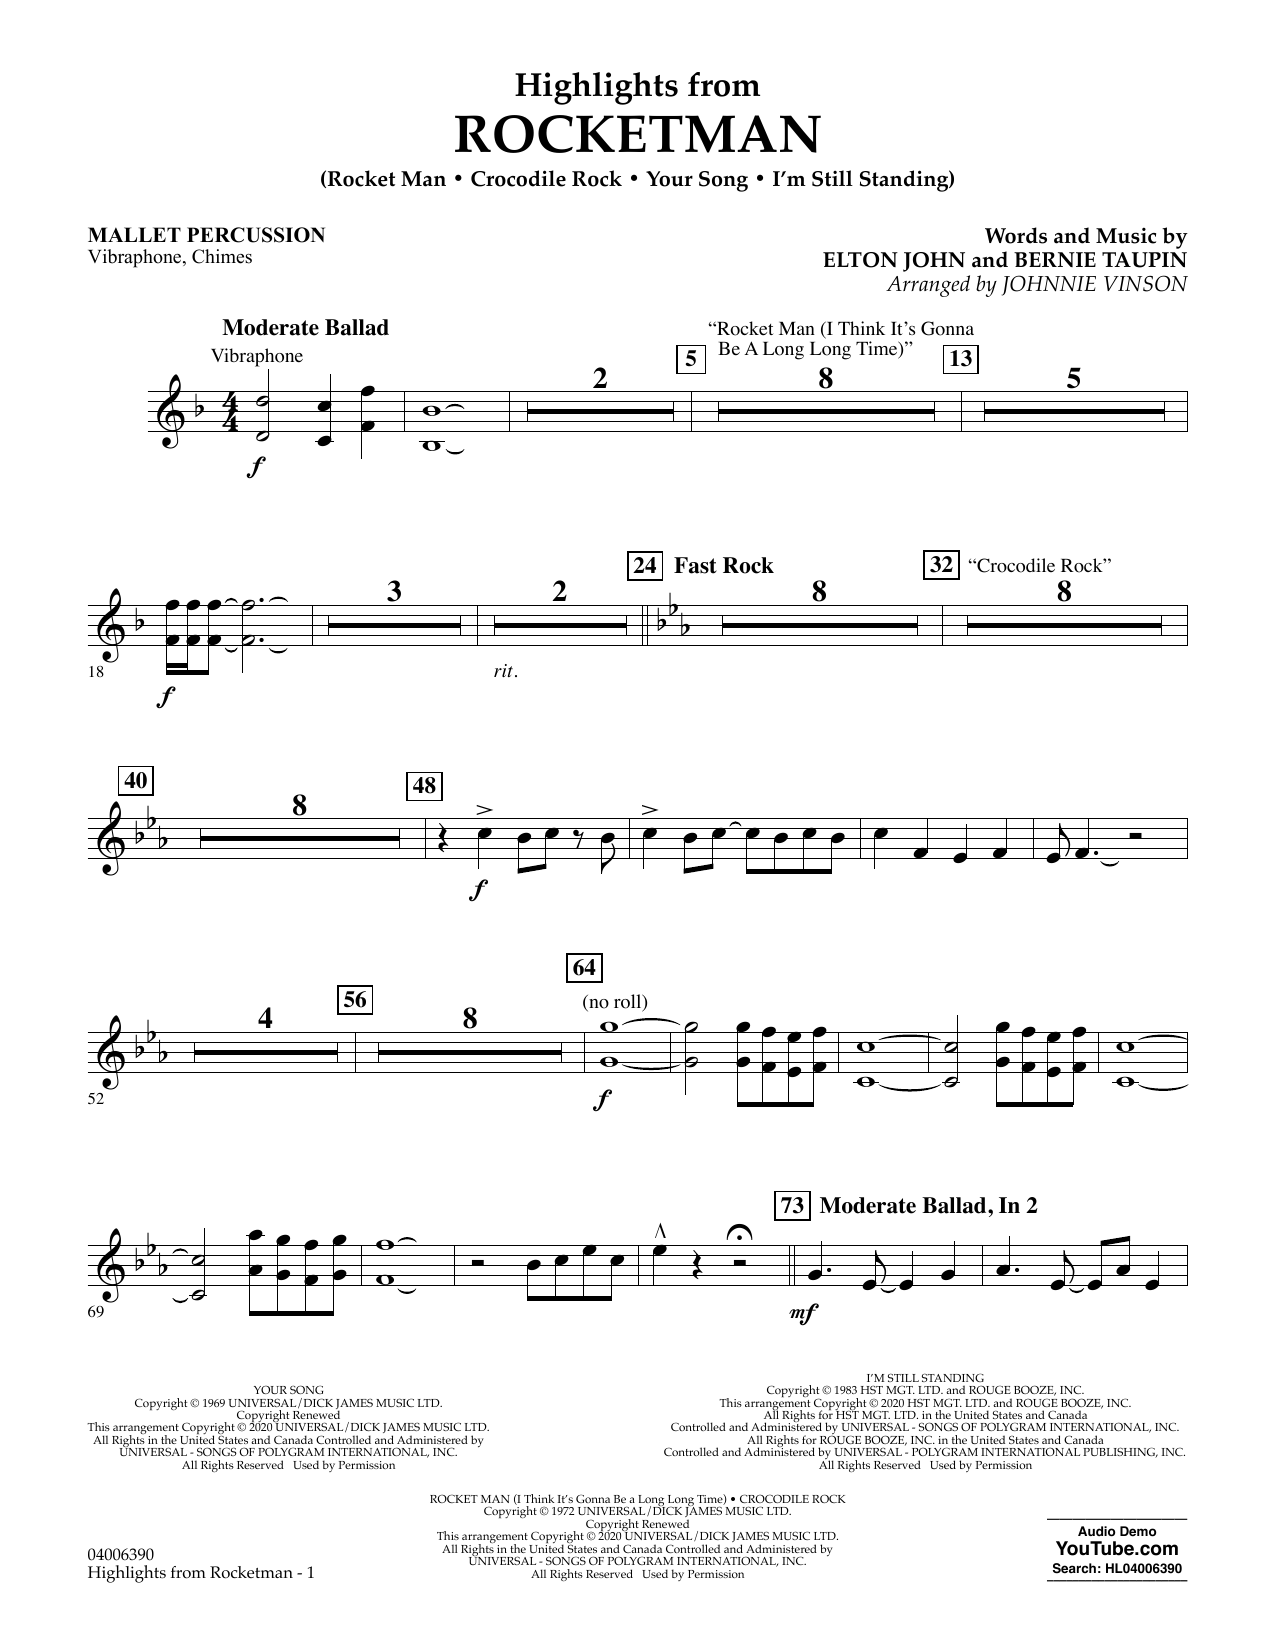 Highlights from Rocketman (arr. Johnnie Vinson) - Mallet Percussion (Flex-Band)